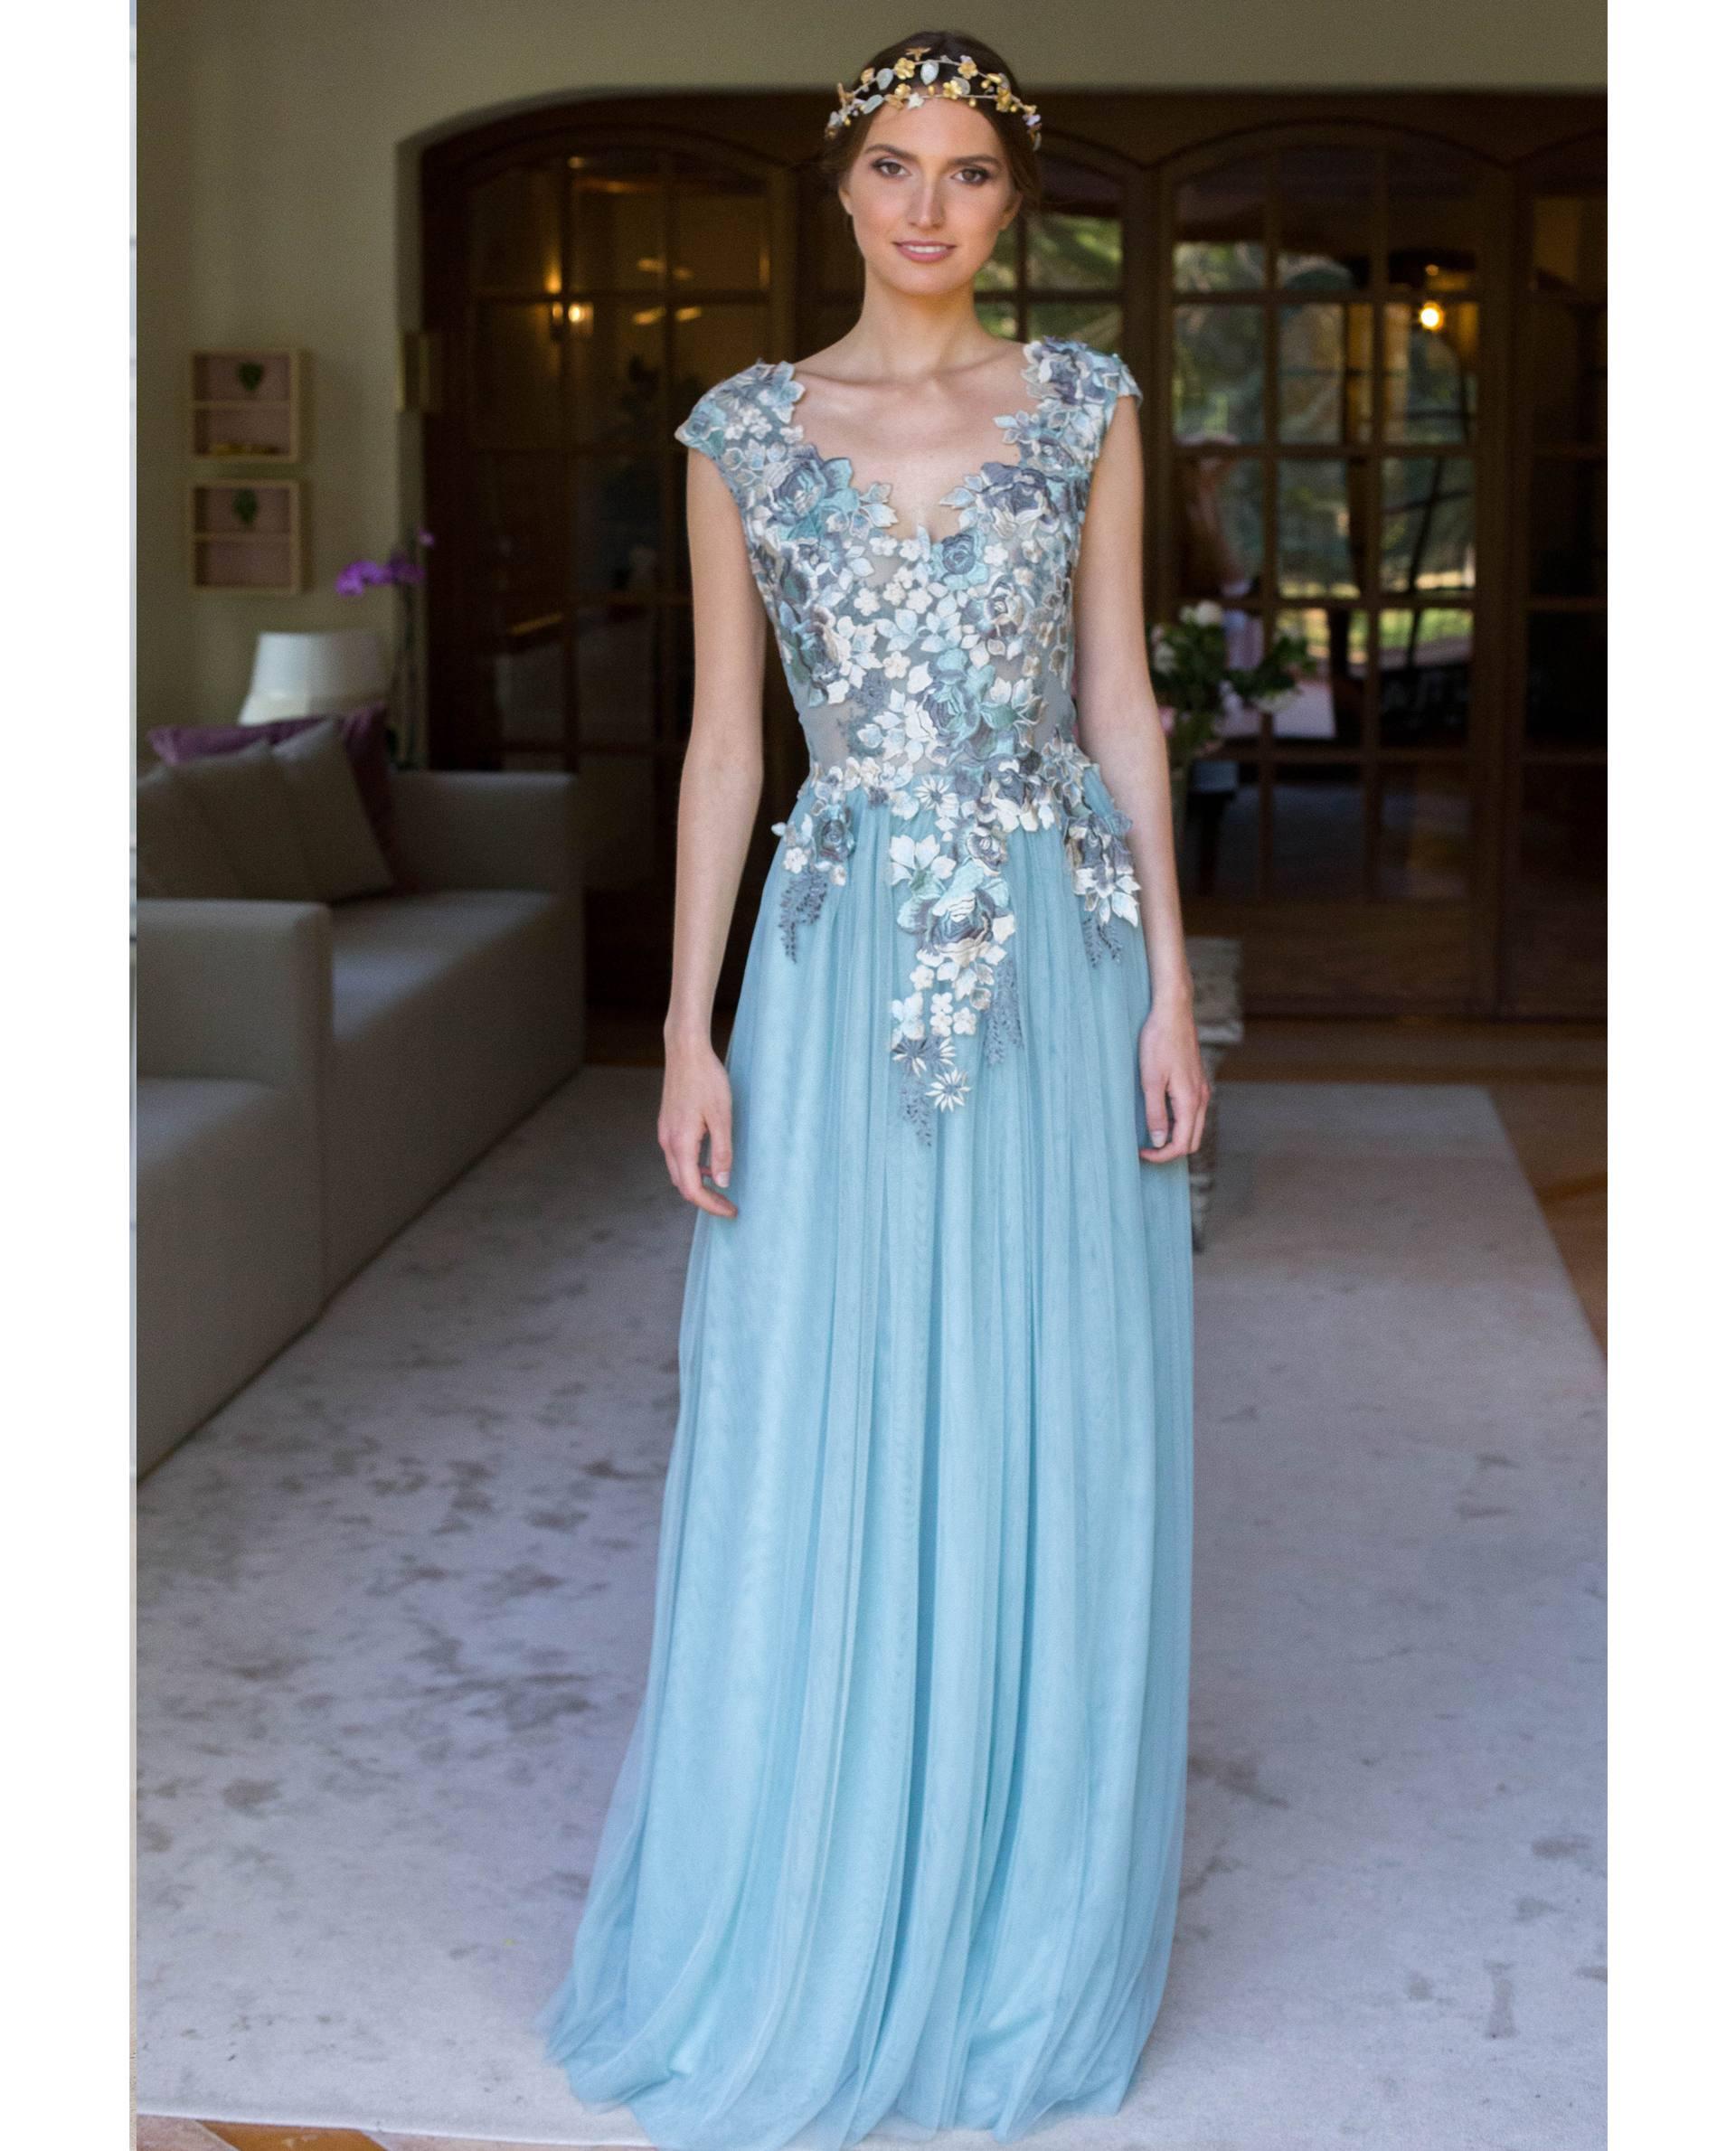 ATELIER-NATURE 2018/19 - VESTIDOS - vestido fiesta JOSÉPHINE azul